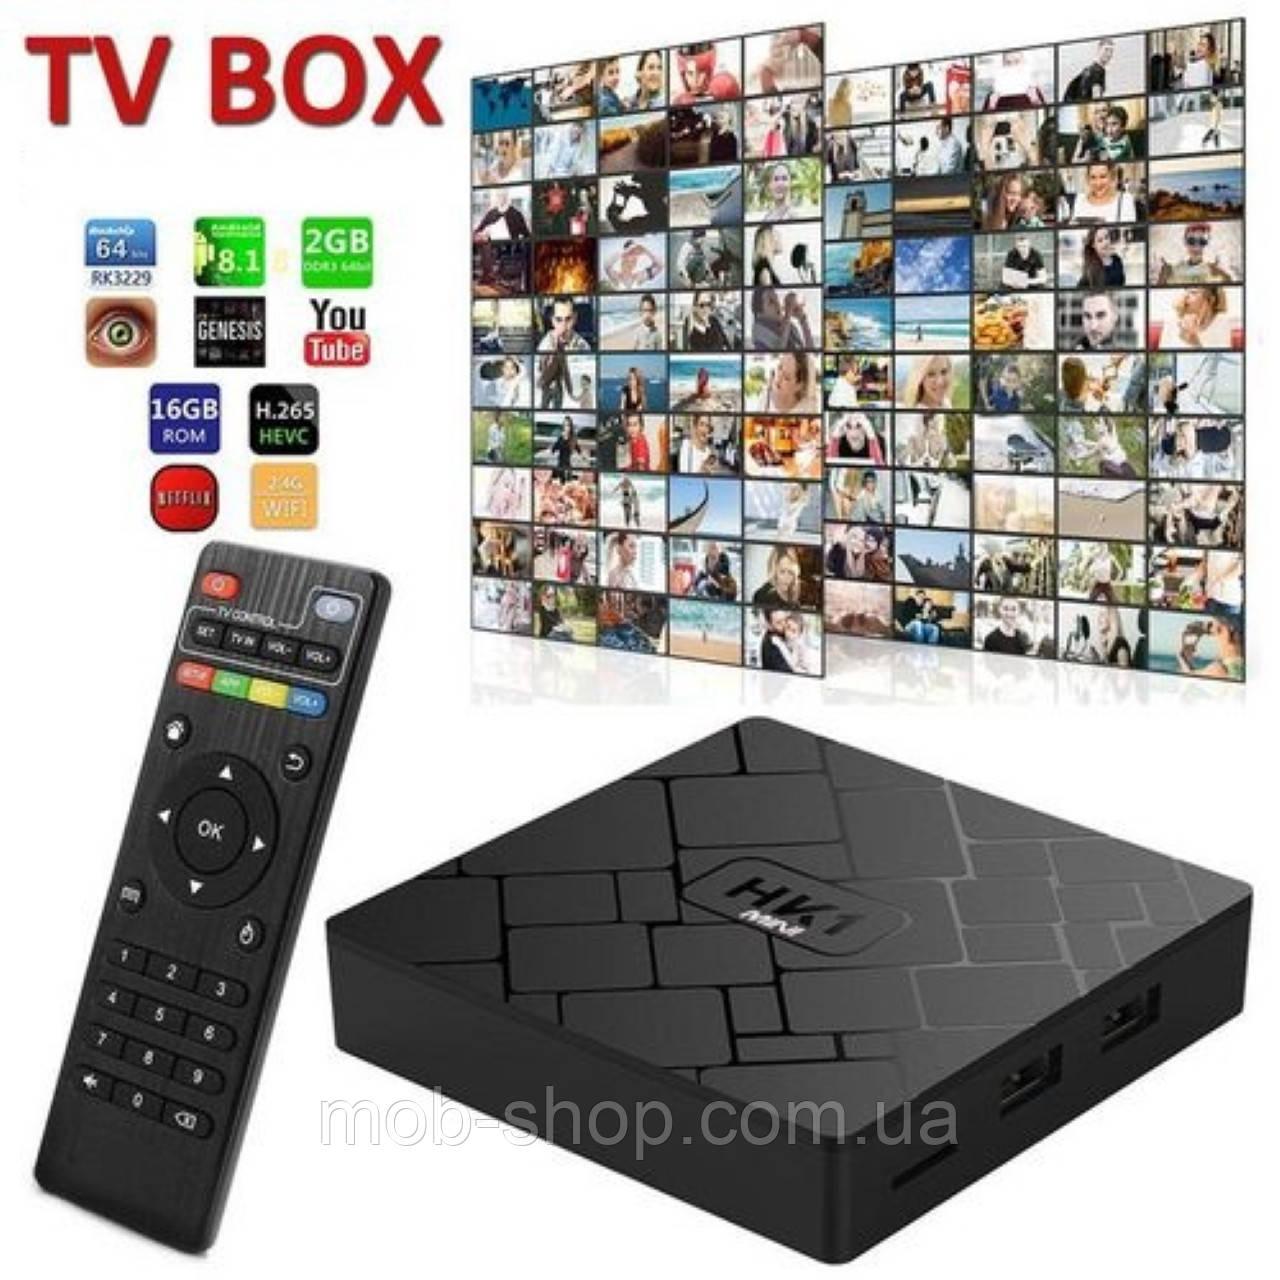 Смарт приставка TV Box HK1 Mini Android 2гб/16 гб Smart TV (смарт ТВ приставка на адроиде) + 3 месяца Sweet TV